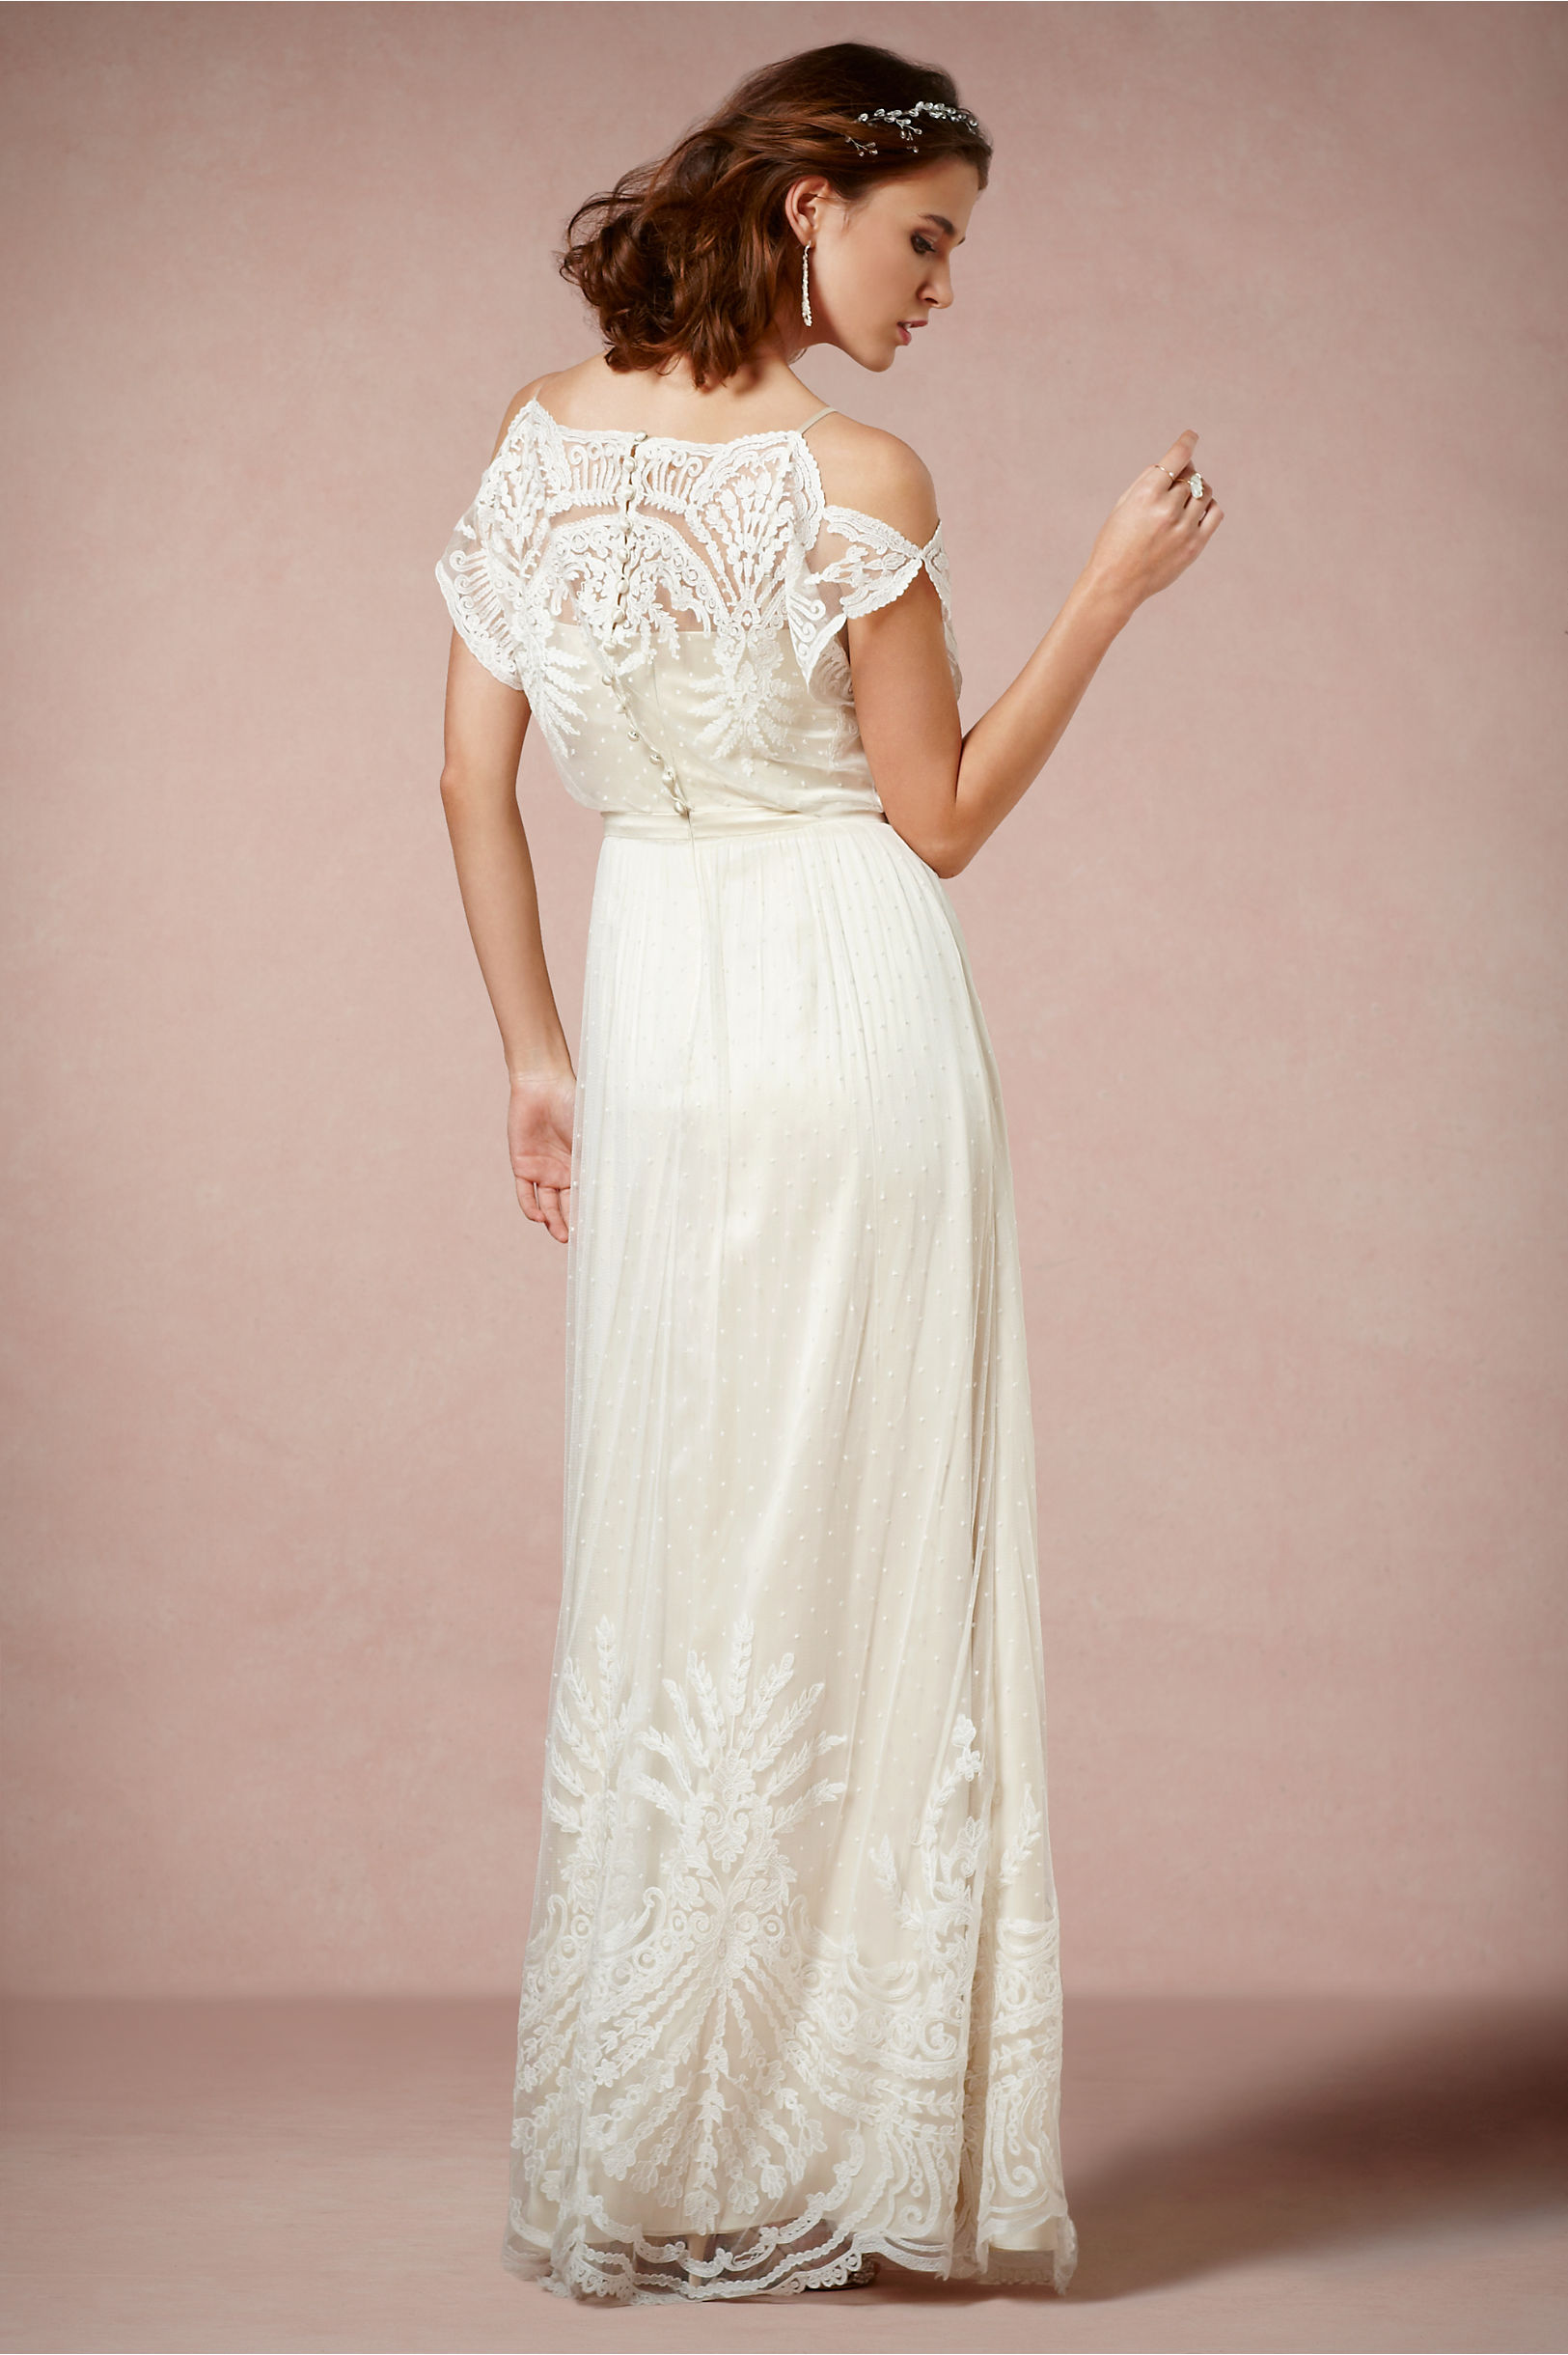 Outstanding Catherine Giudici Wedding Dress Motif - Wedding Dress ...